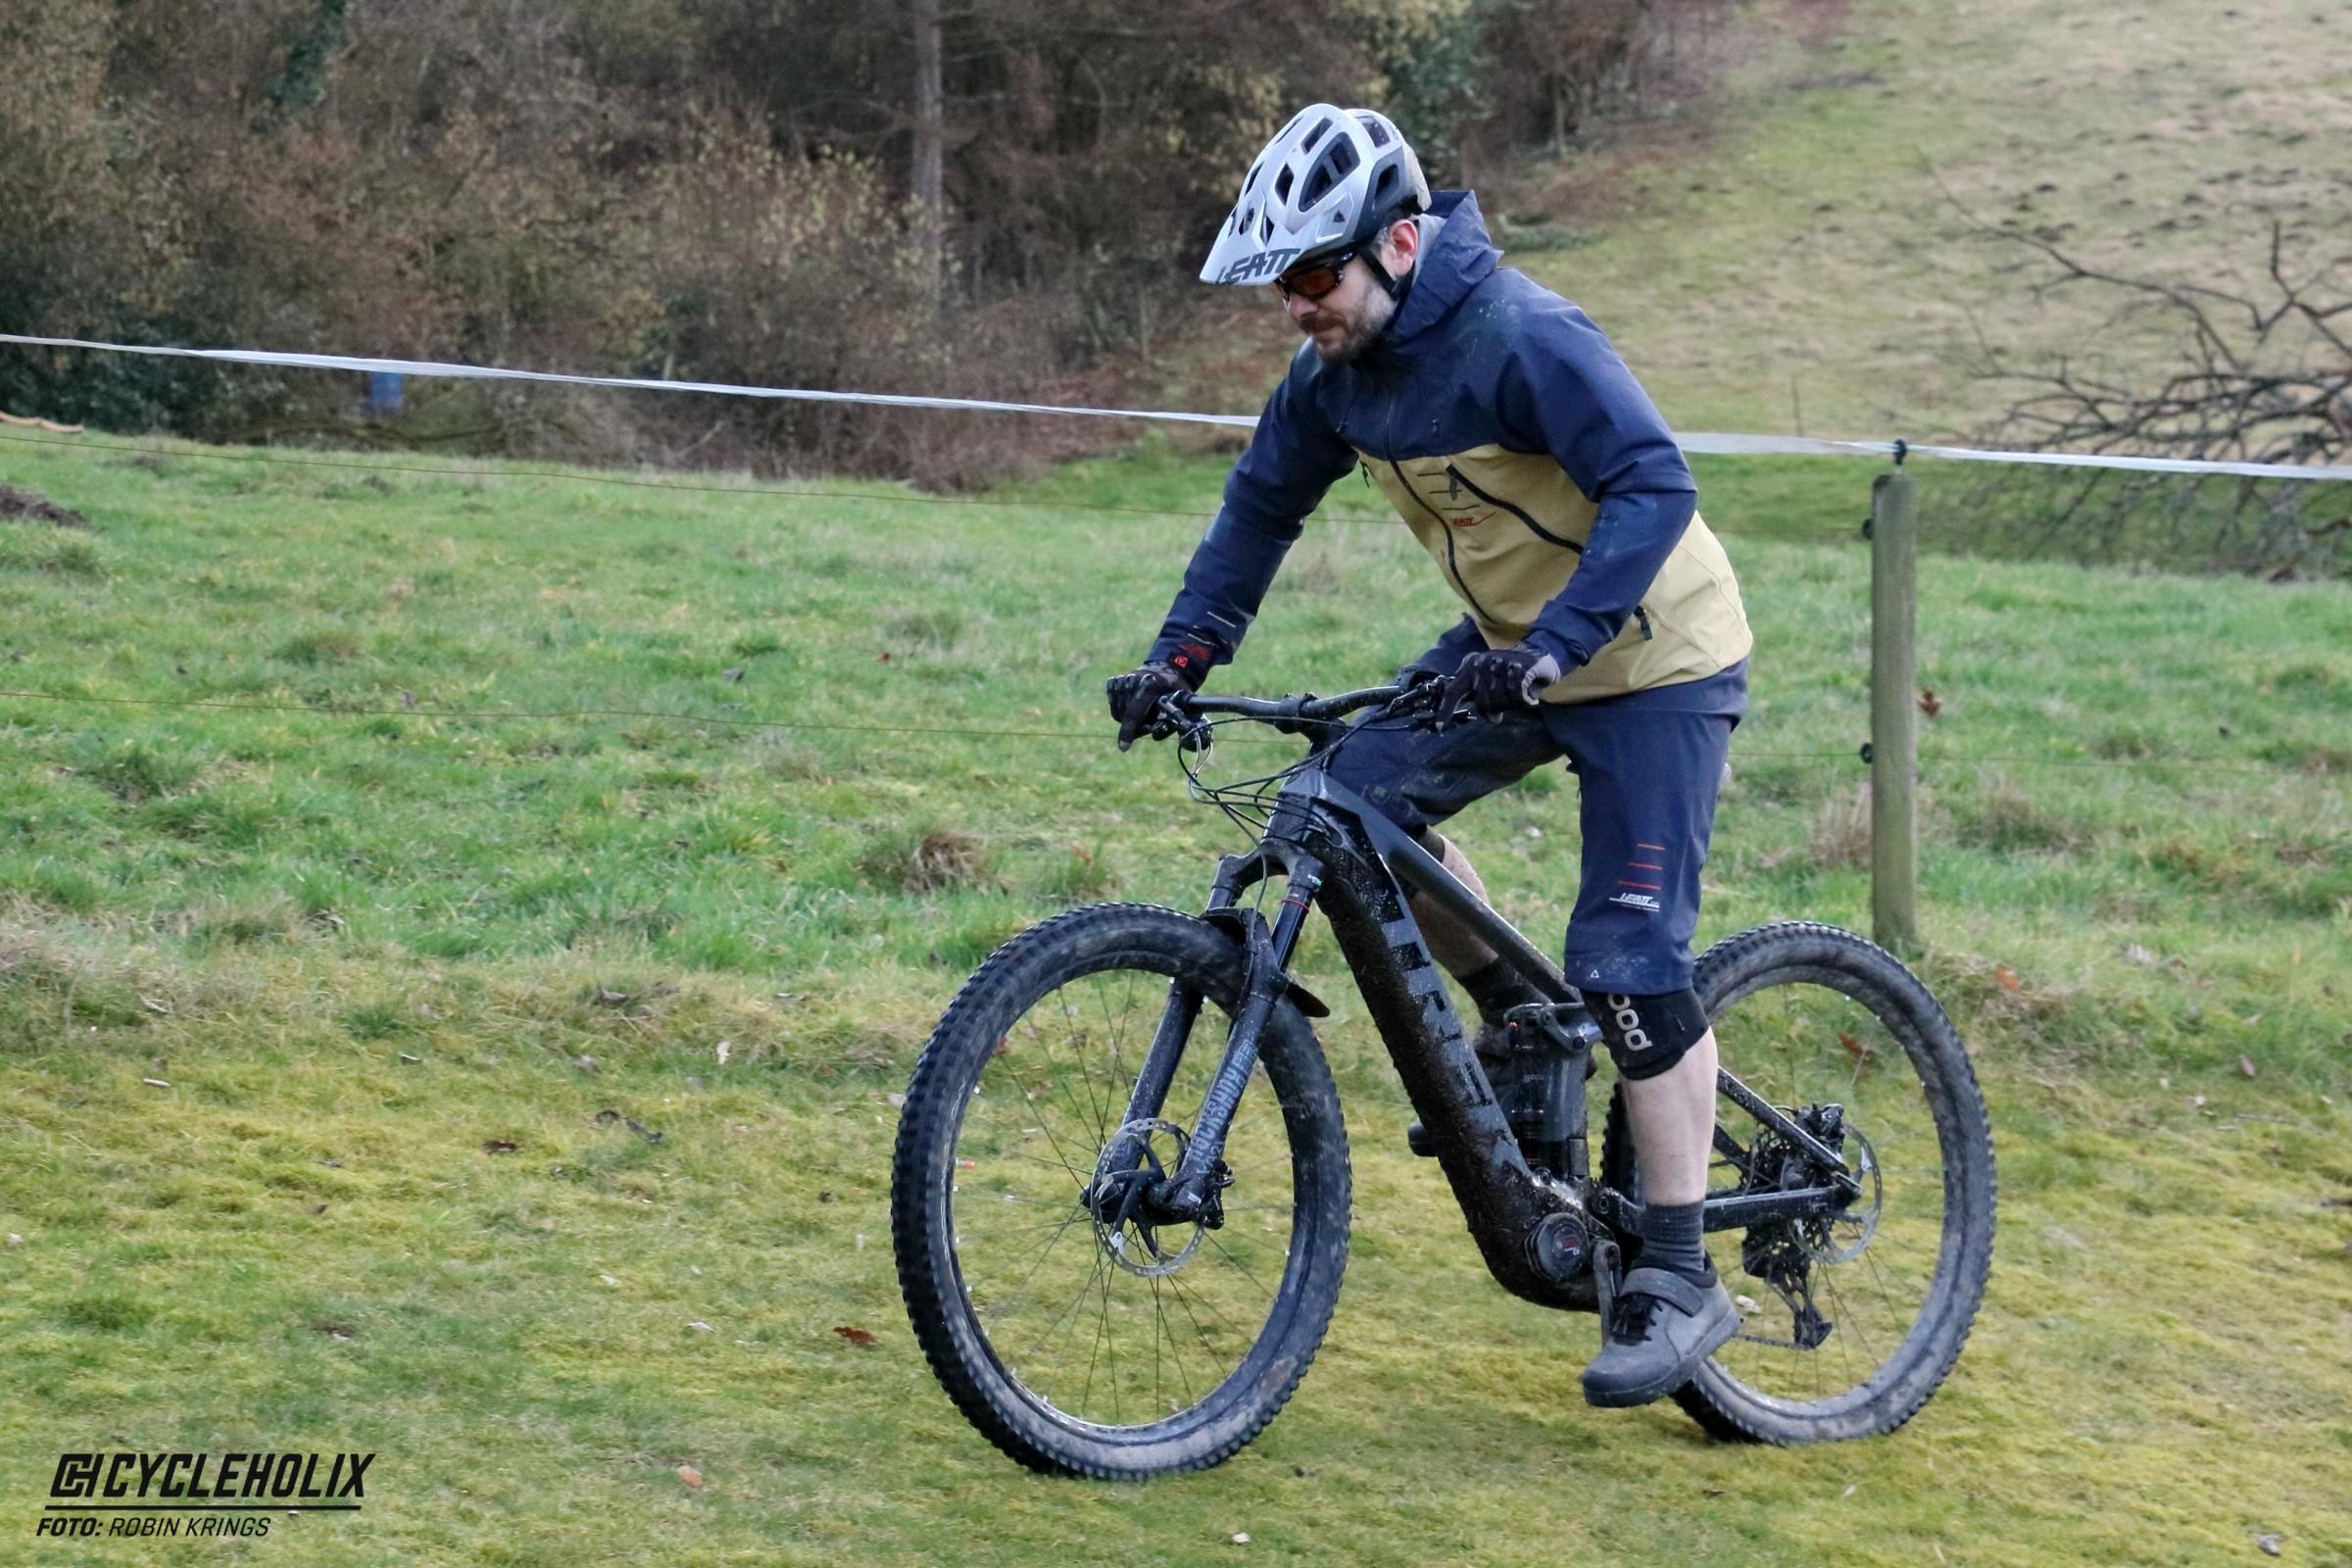 Leatt DBX Cycleholix